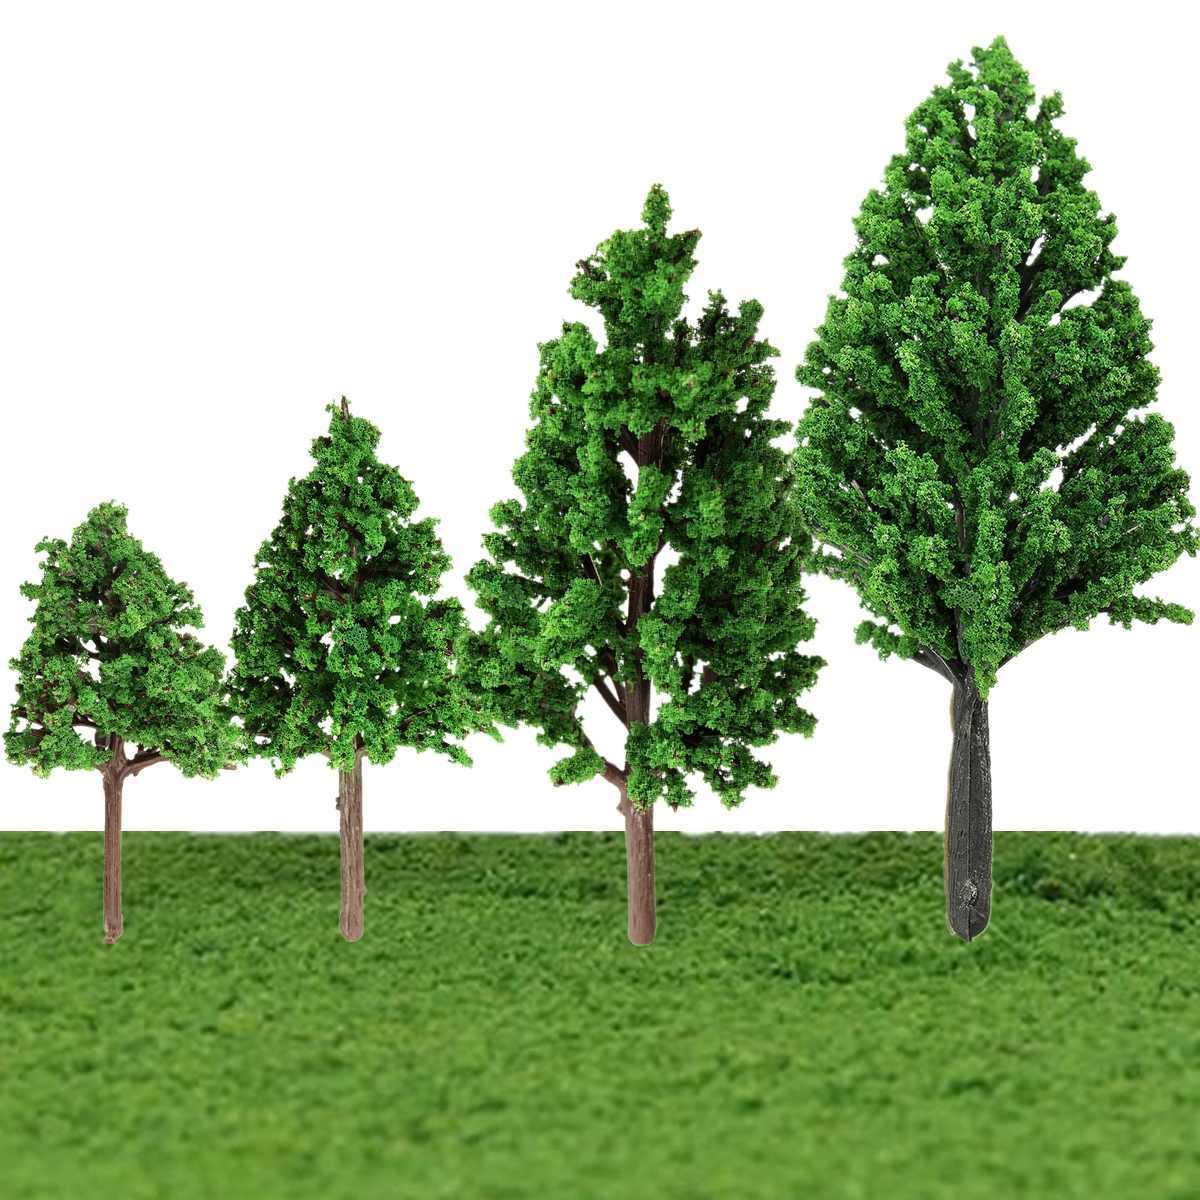 1PC 1:100-300 5cm 6cm 8cm 10cm Train Layout Model Trees Scale Garden Scenery Railroad landscape Mini Model Trees Toys